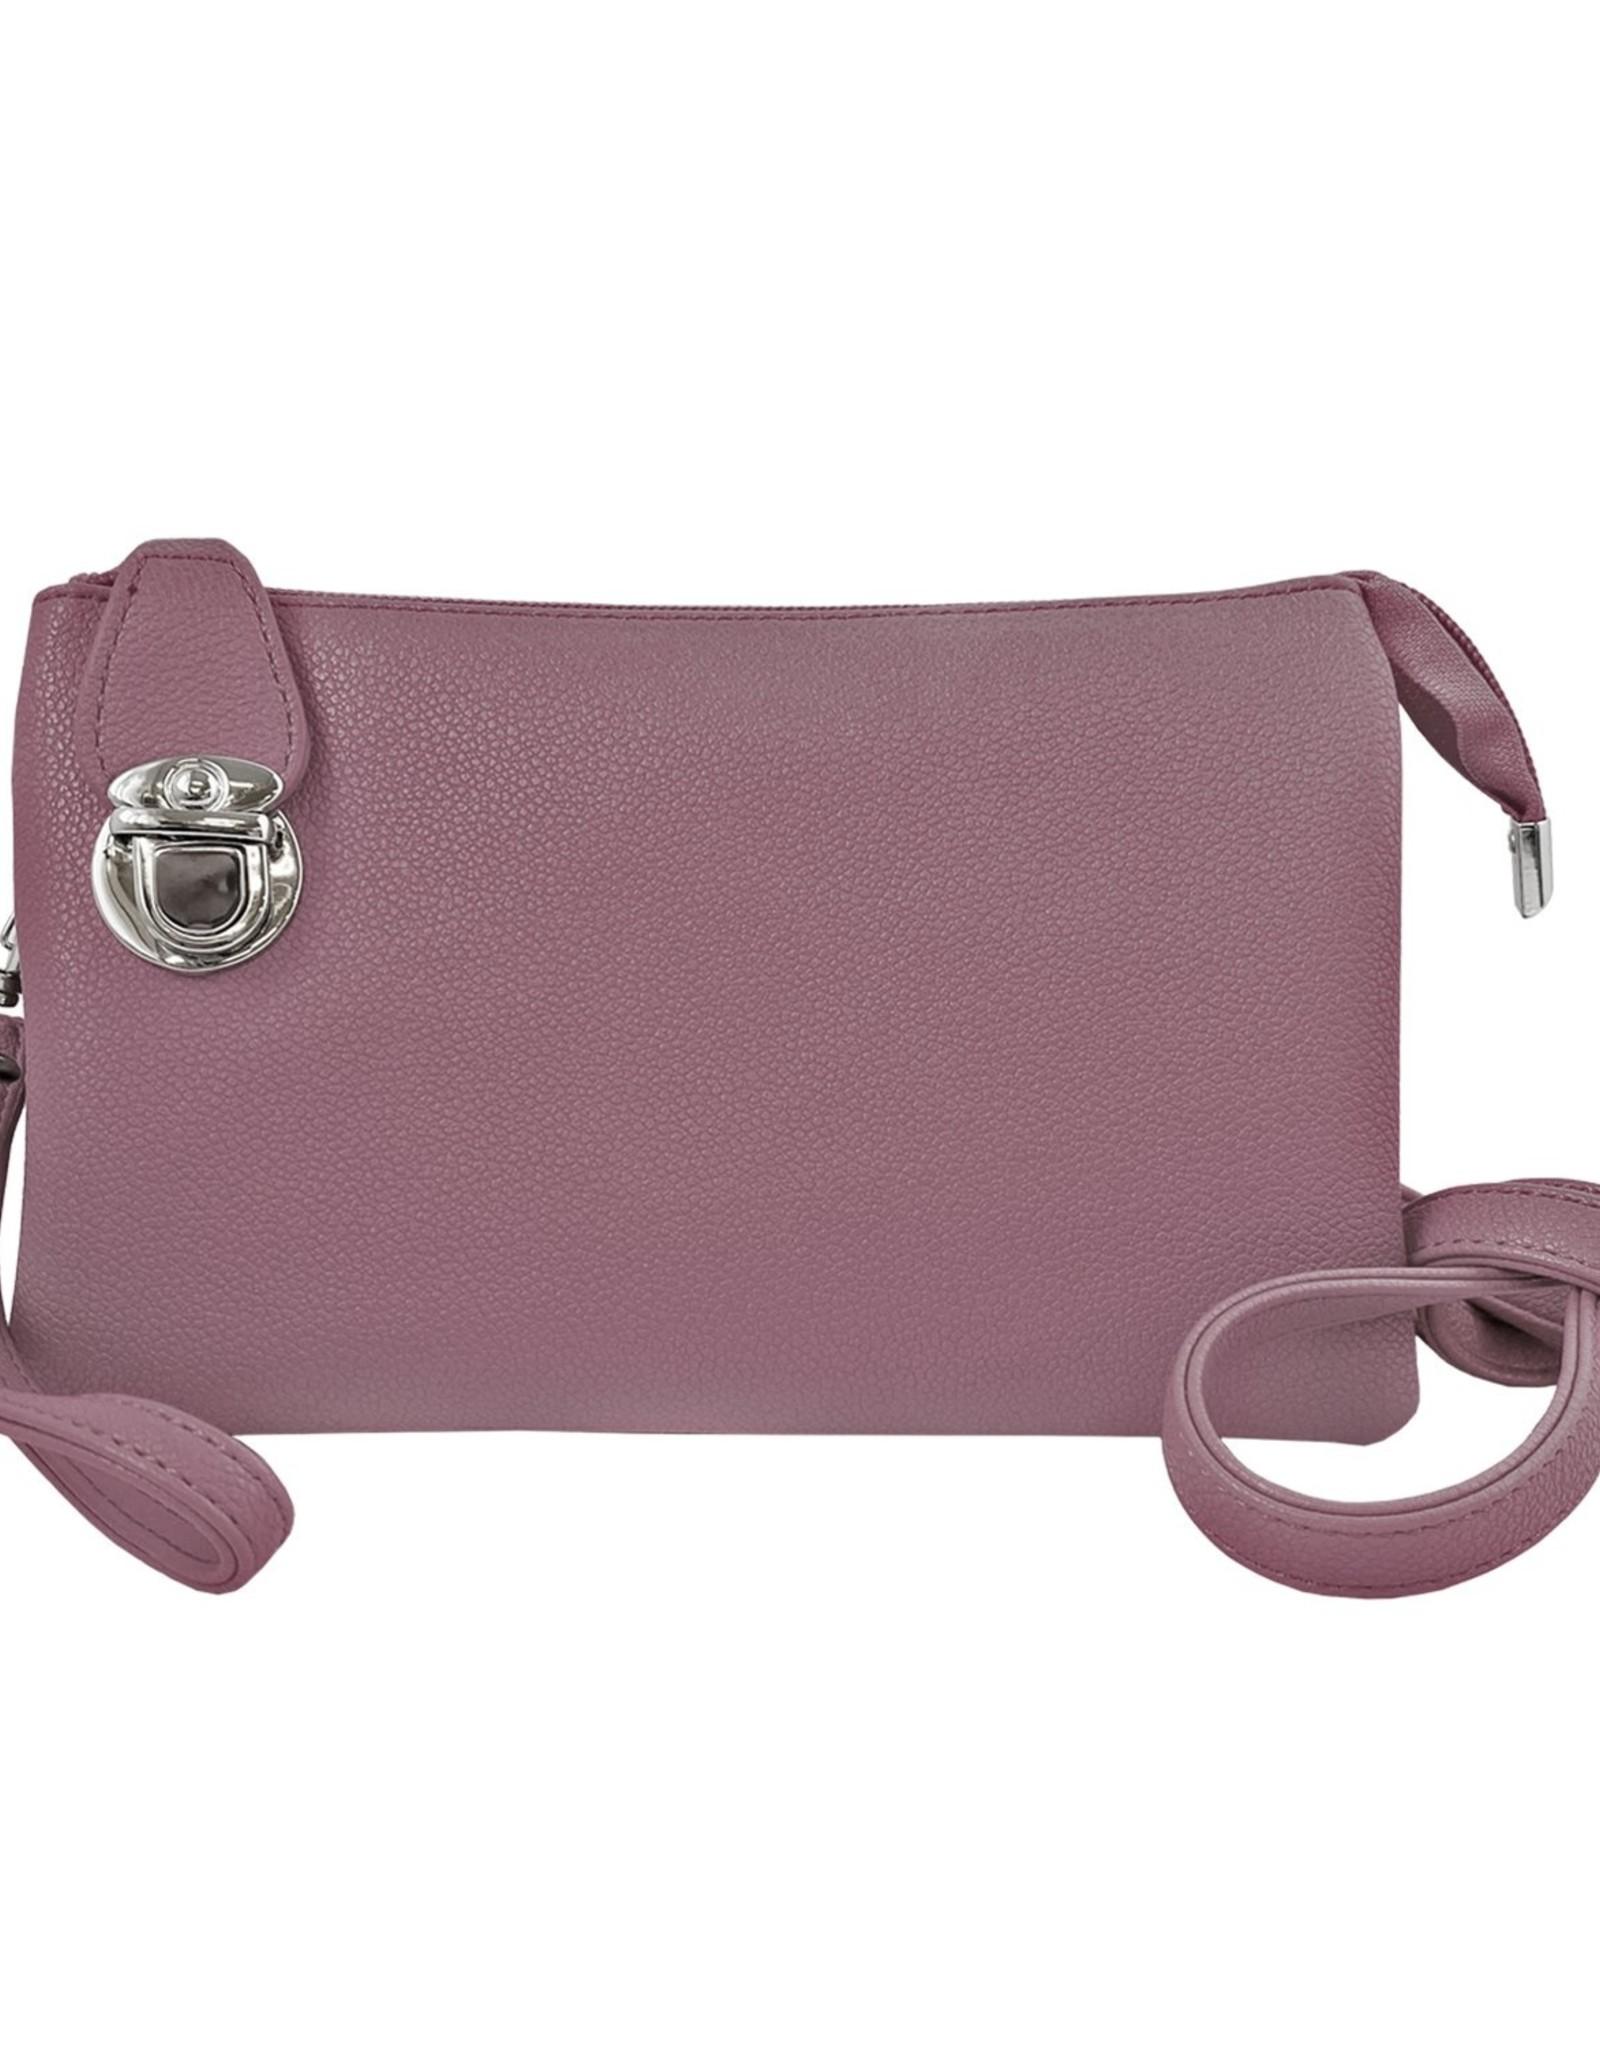 Caracol Multi-pocket Cross-body Bag